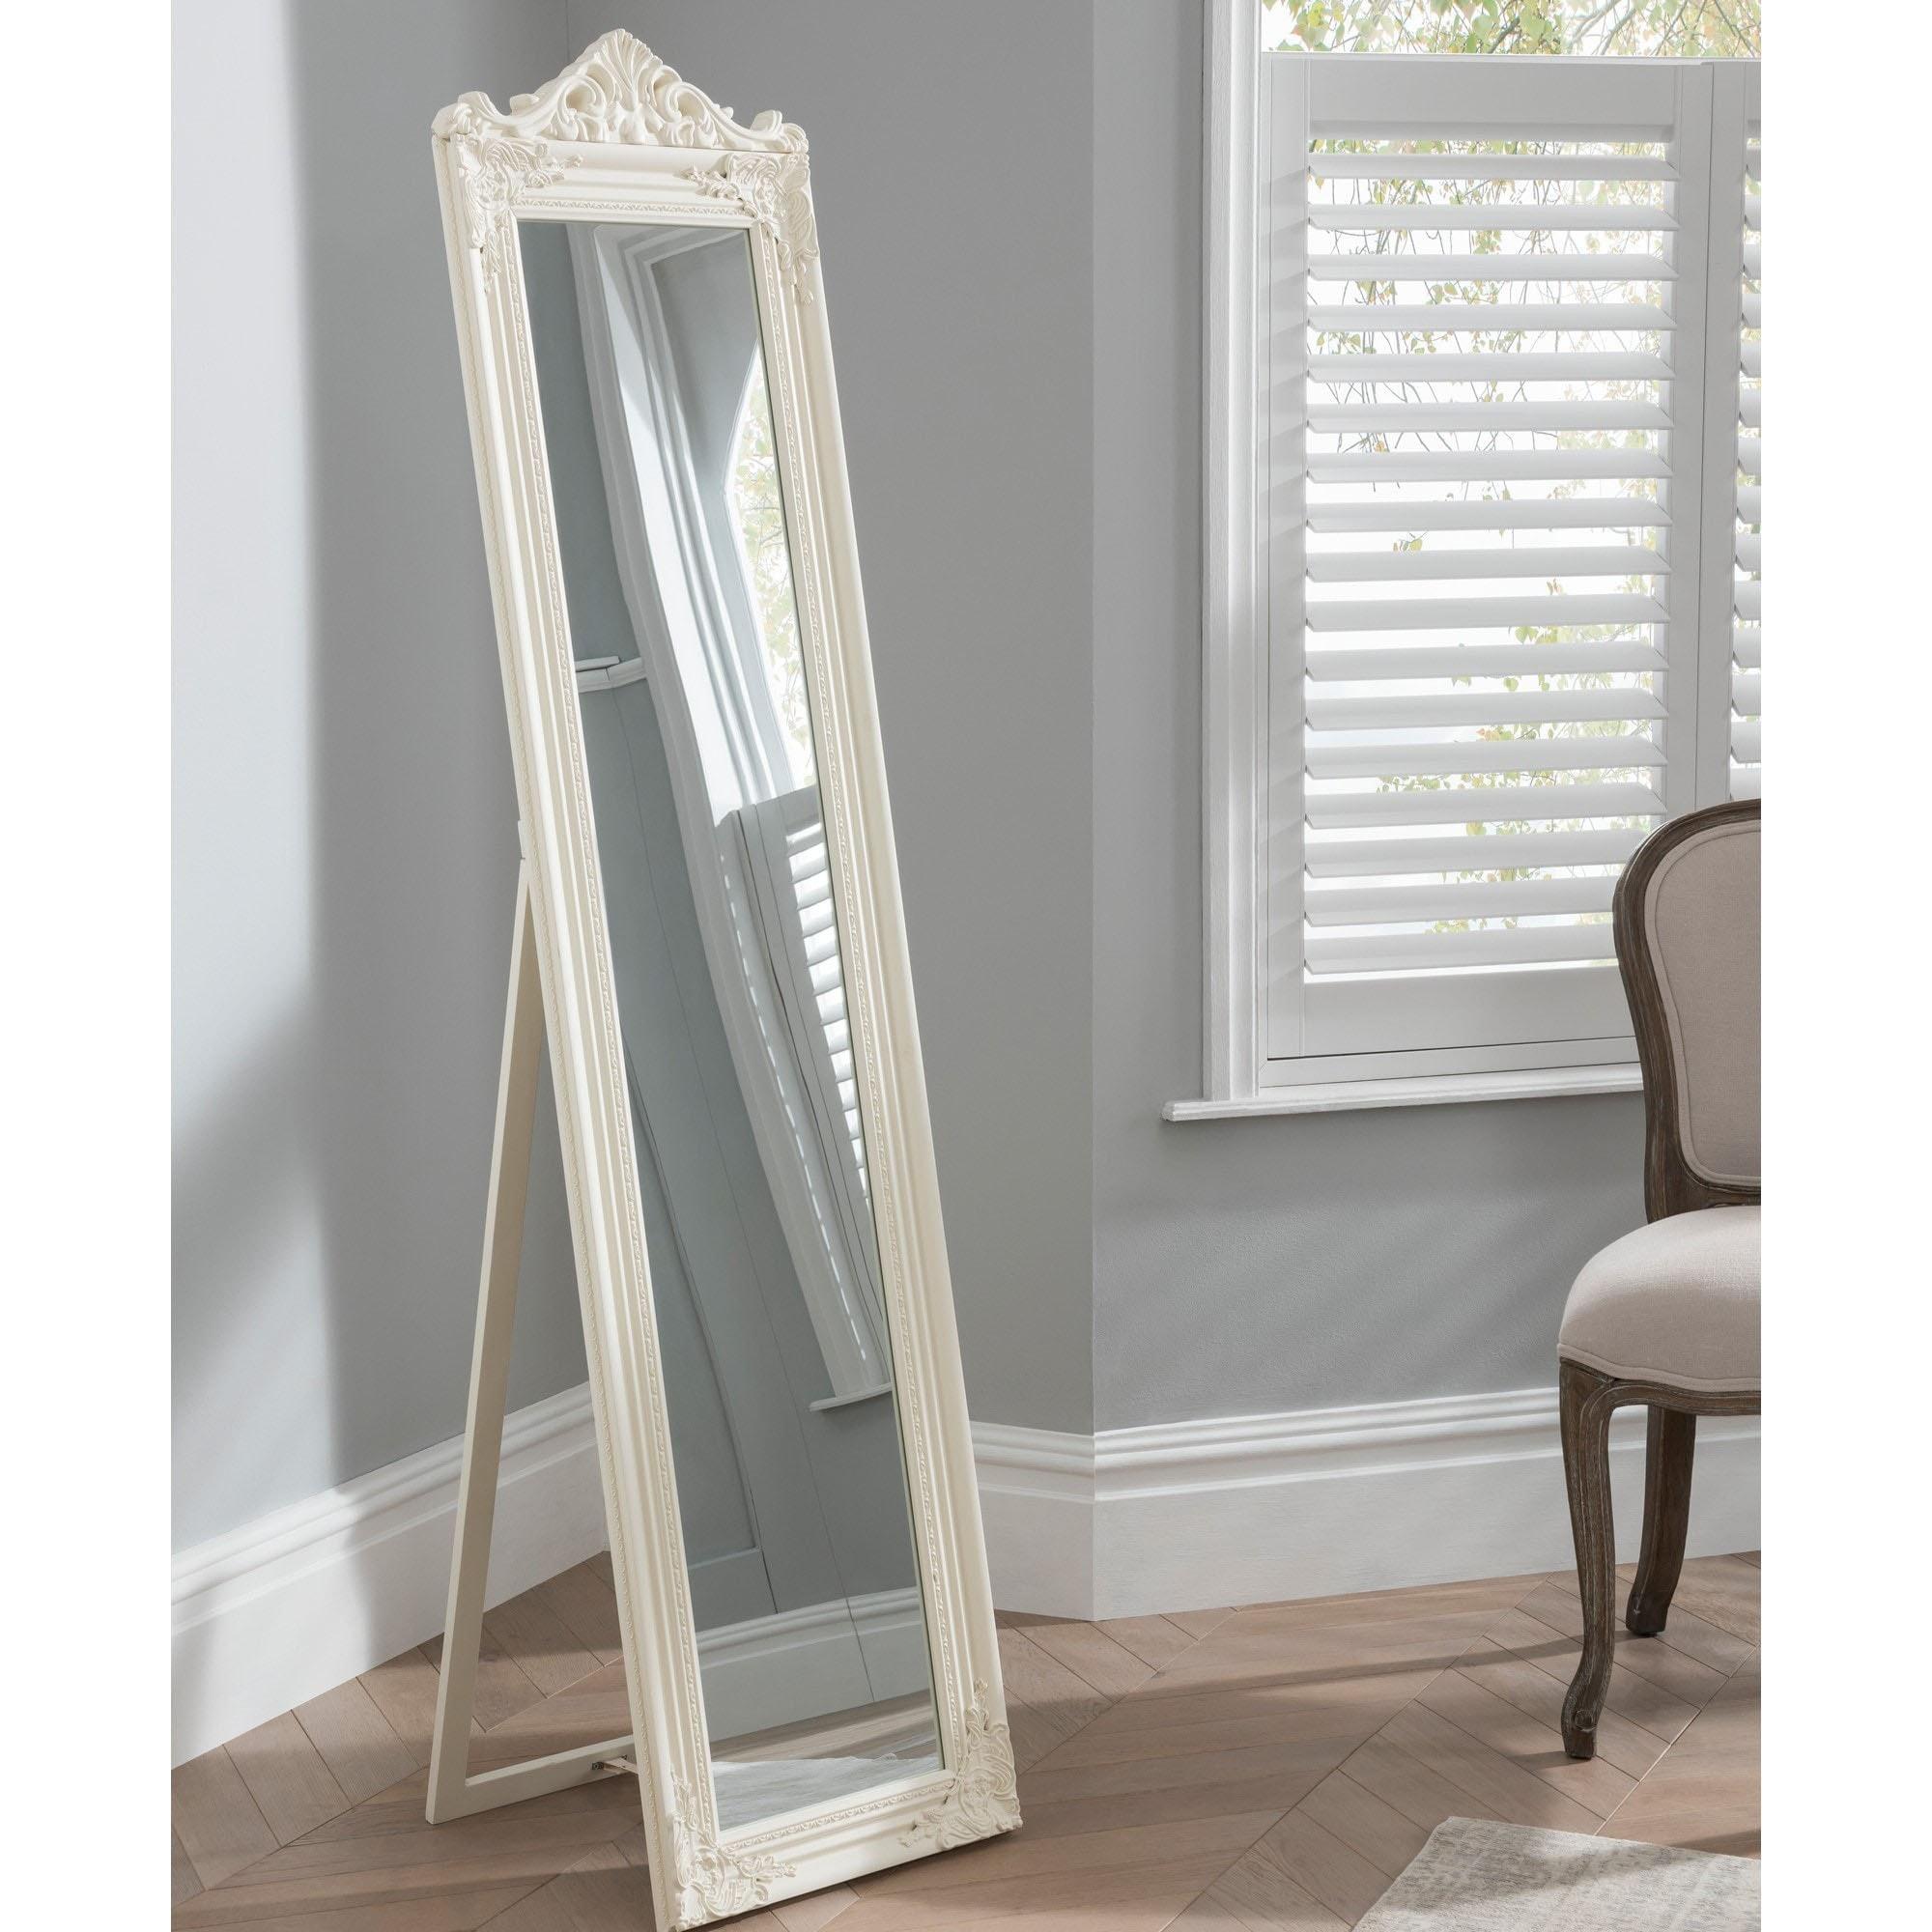 Full Length Mirror In Cream The Elizabeth Floor Standing Mirror